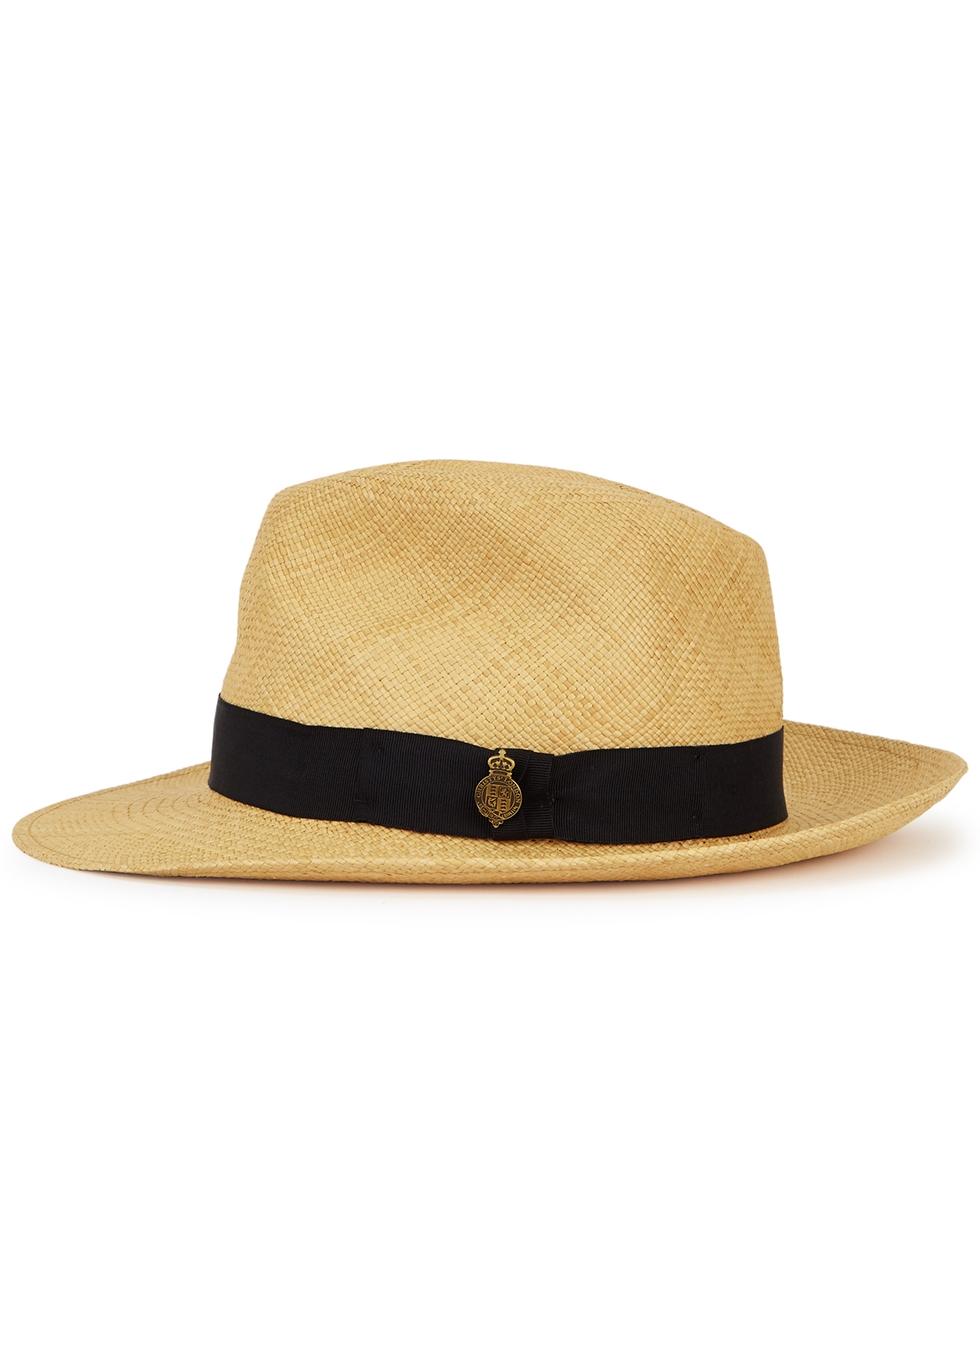 Notting Hill light brown panama hat